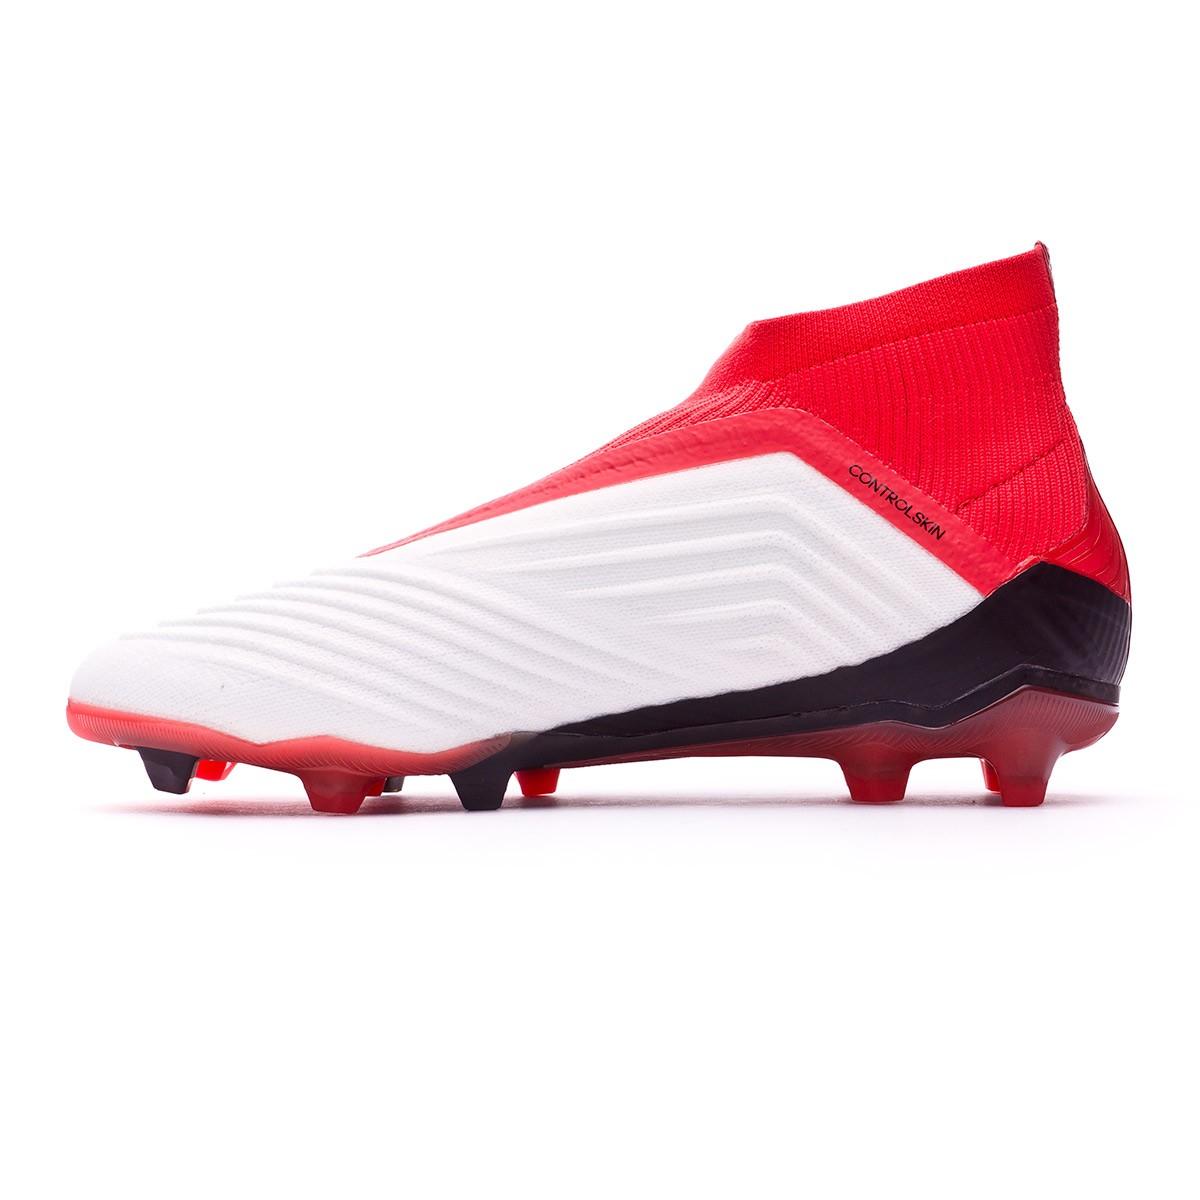 e7deb6d3036 Zapatos de fútbol adidas Predator 18+ FG Niño White-Core black-Real coral -  Tienda de fútbol Fútbol Emotion